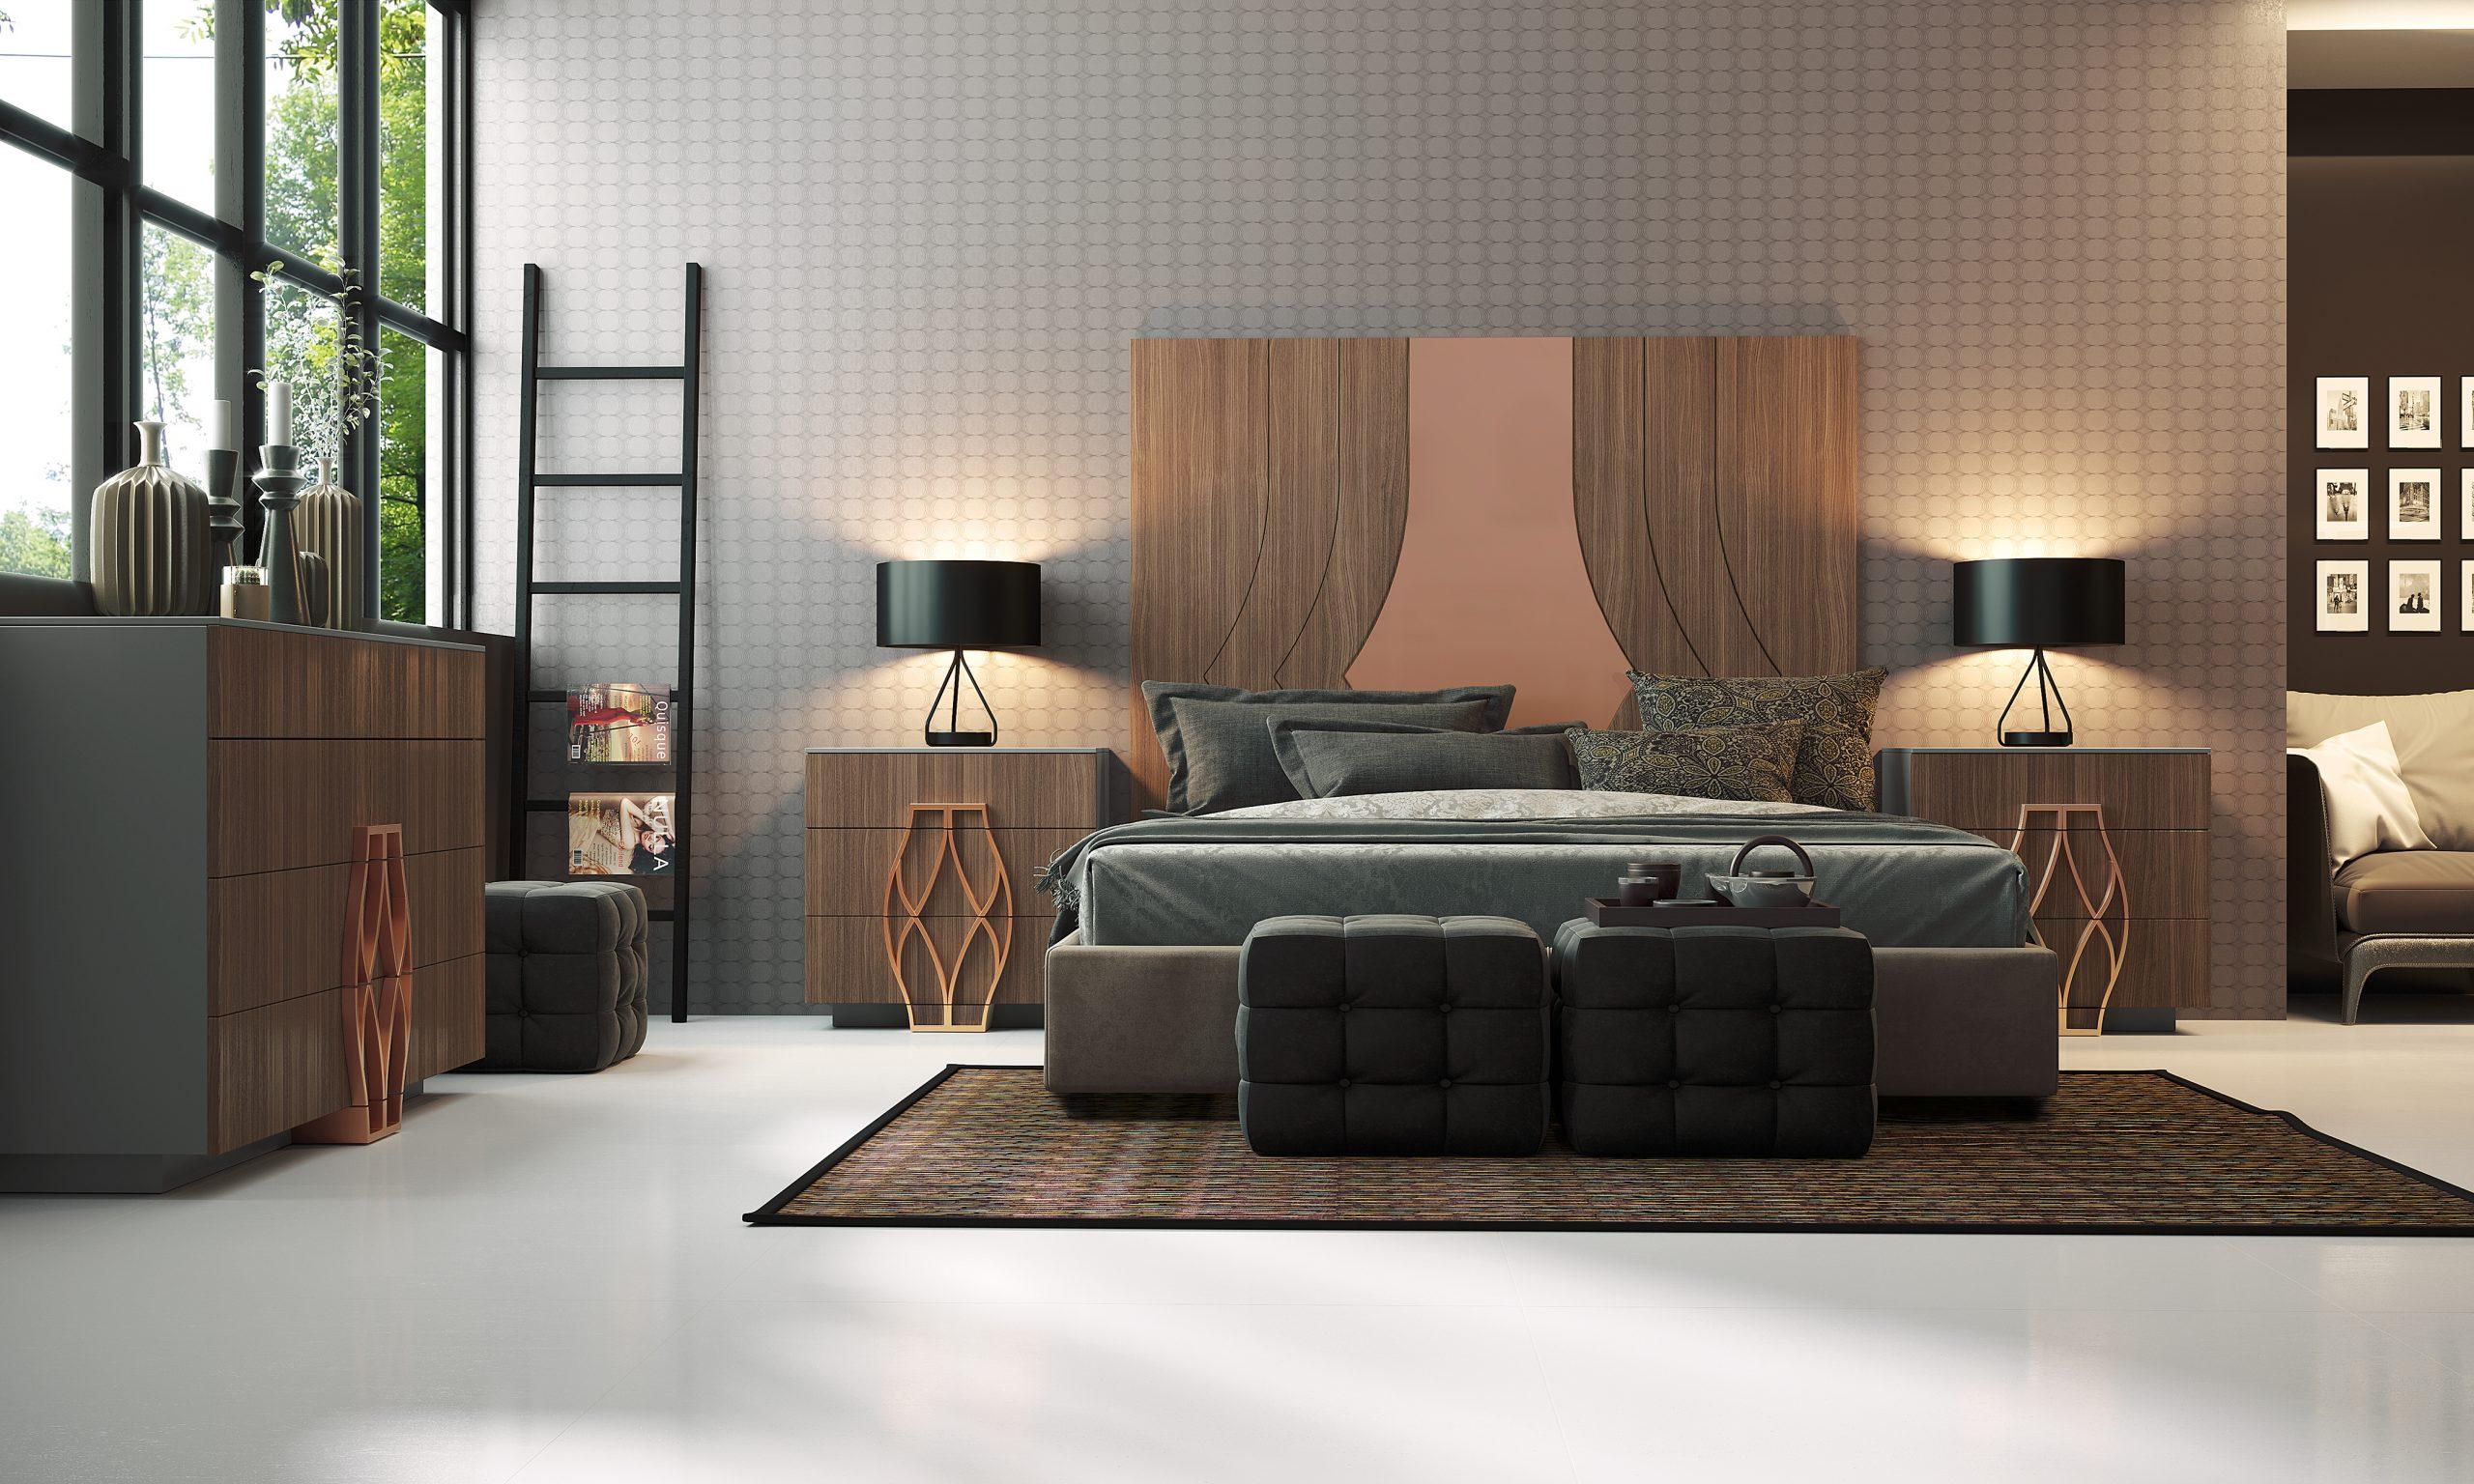 dormitorio-semiclasico-heres01